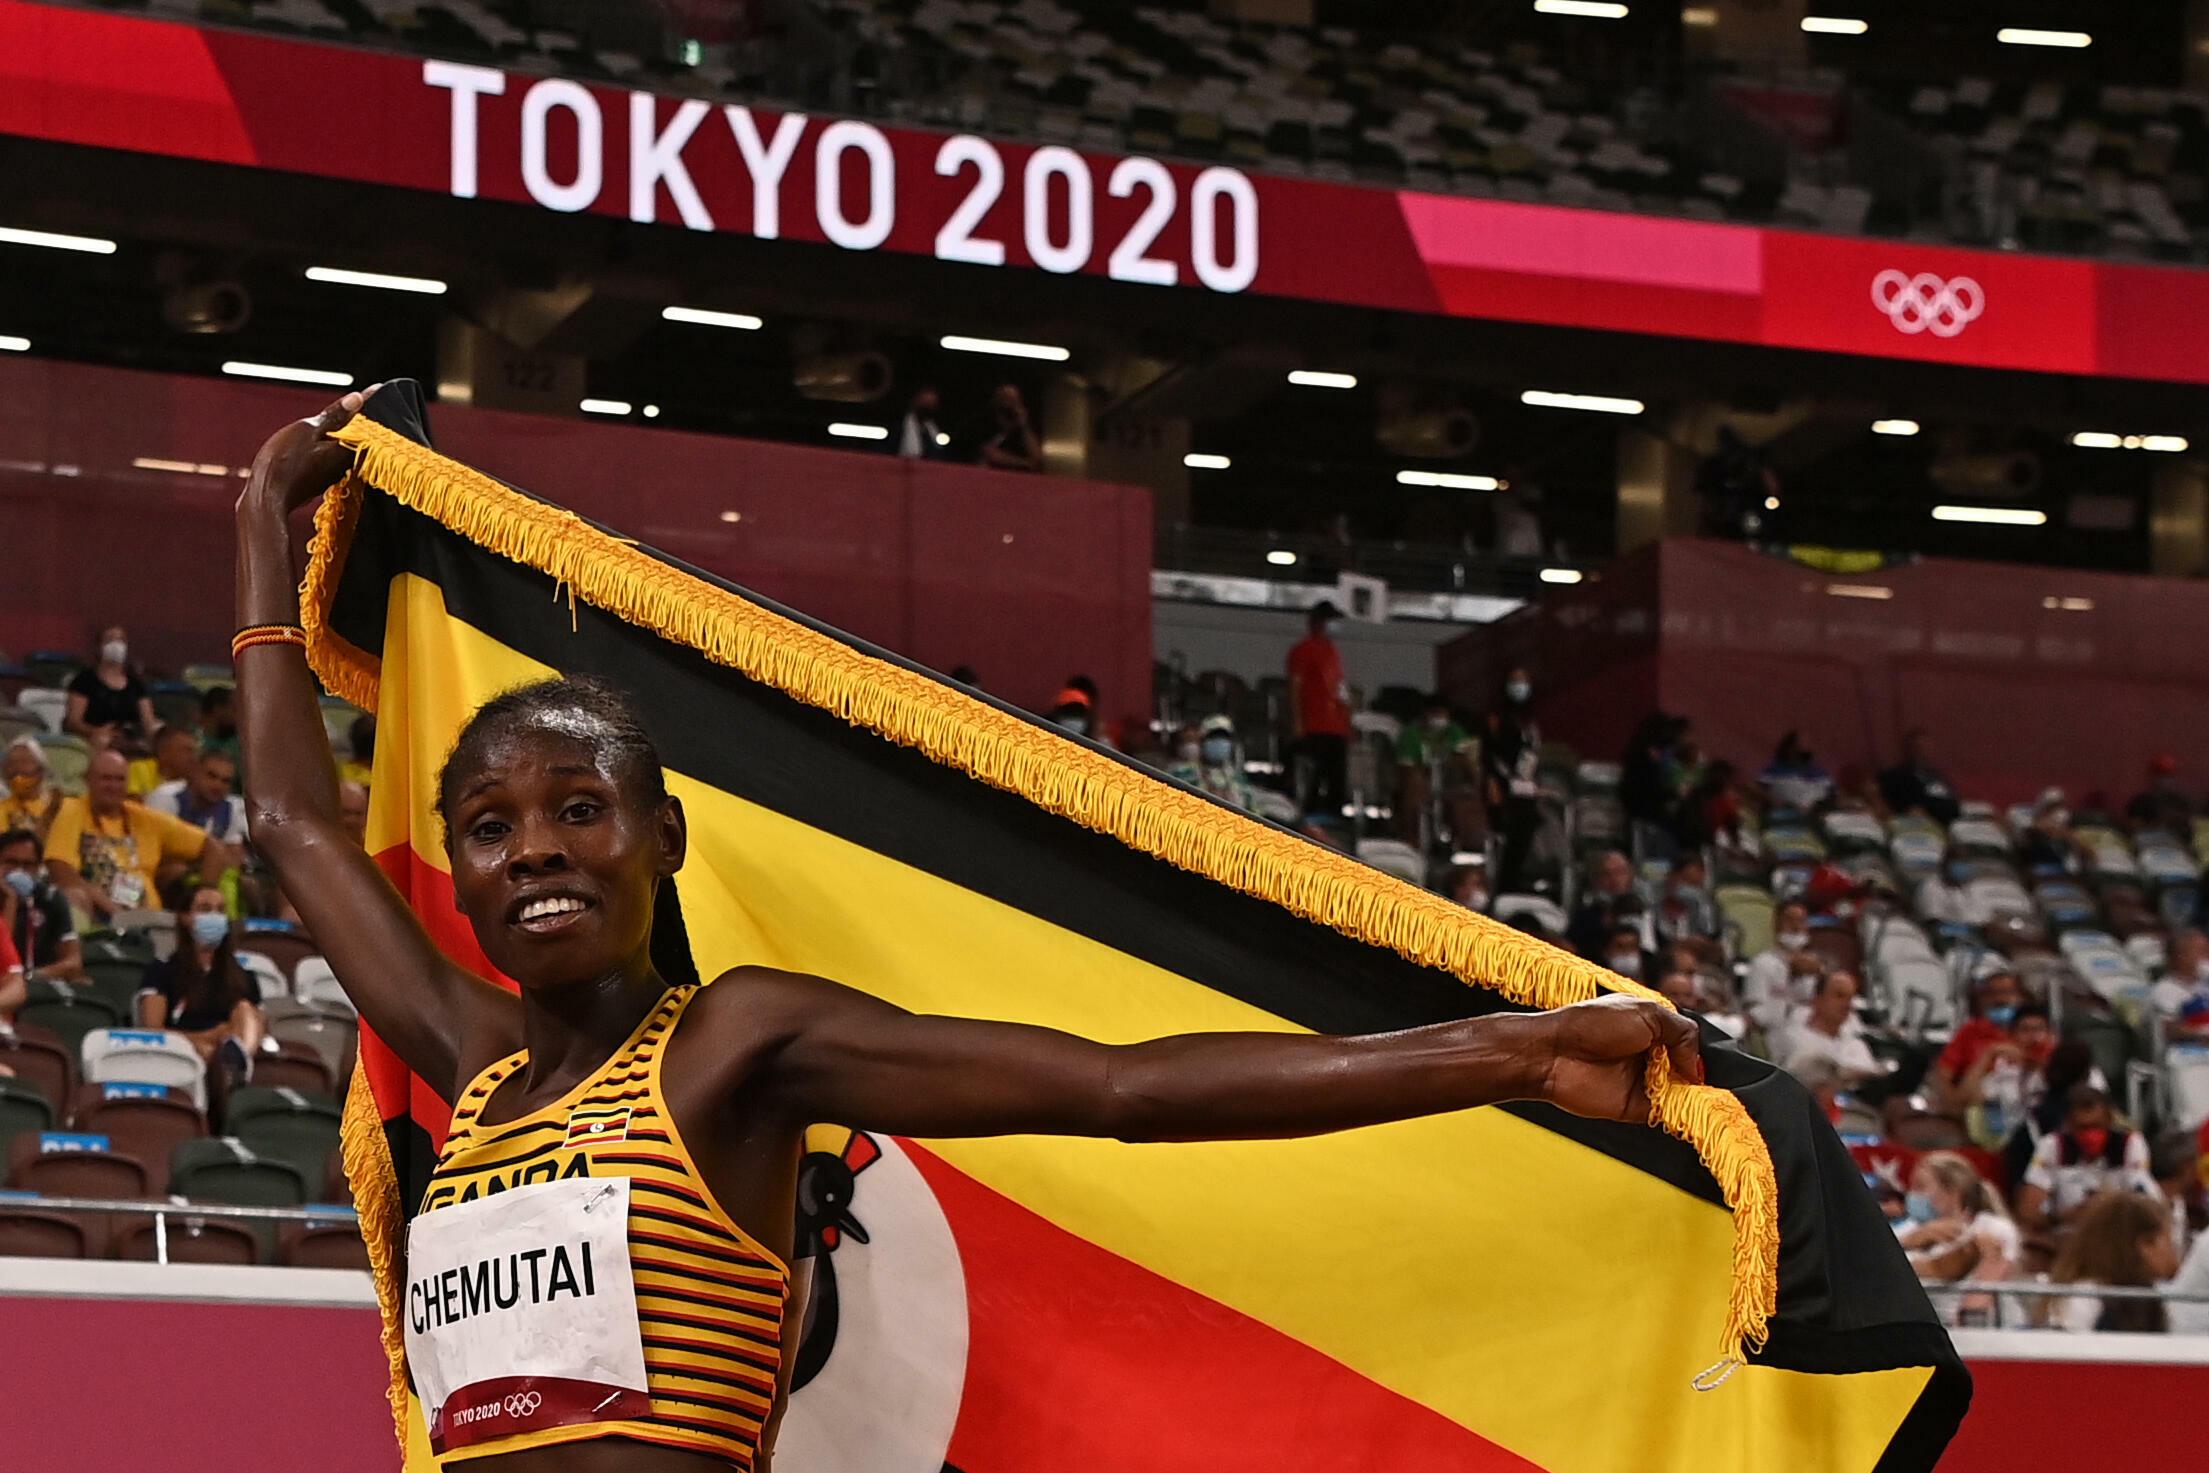 Tokyo 2020:Steeplechase Win Eludes Kenyan Women as Chemutai Wins Uganda's First Ever Olympic Gold